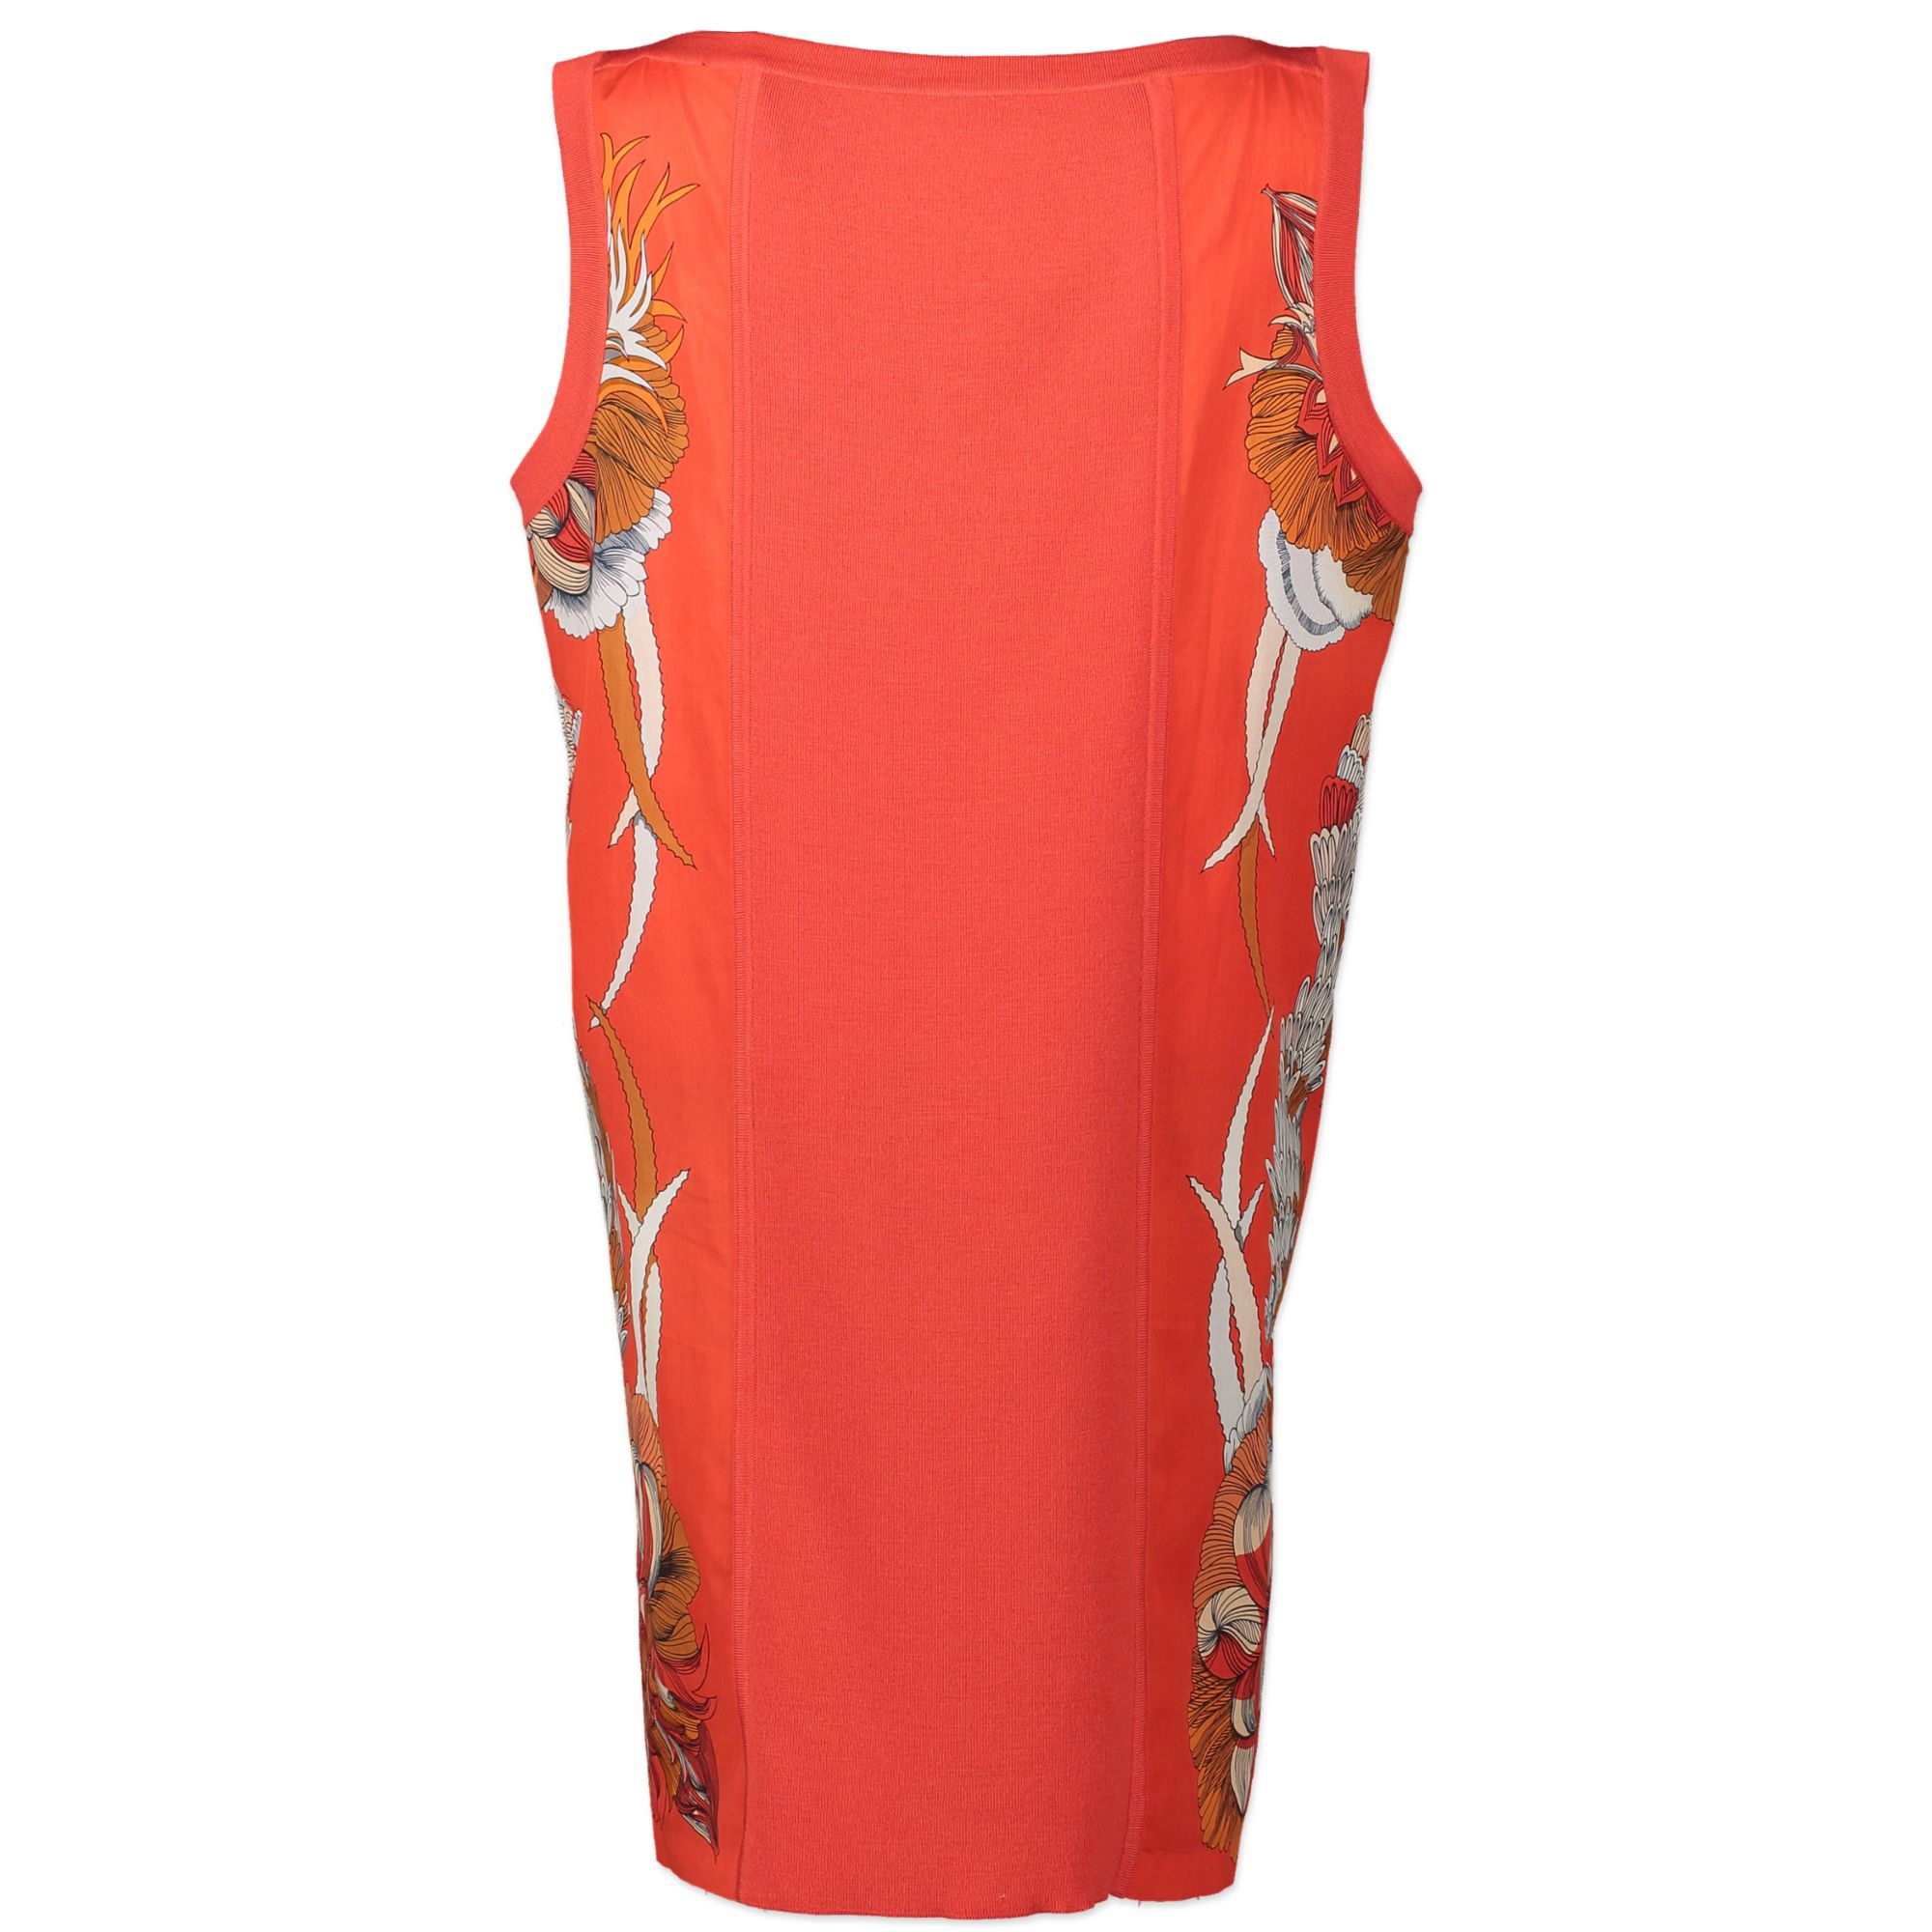 Hermès Red Printed Dress - Size 42